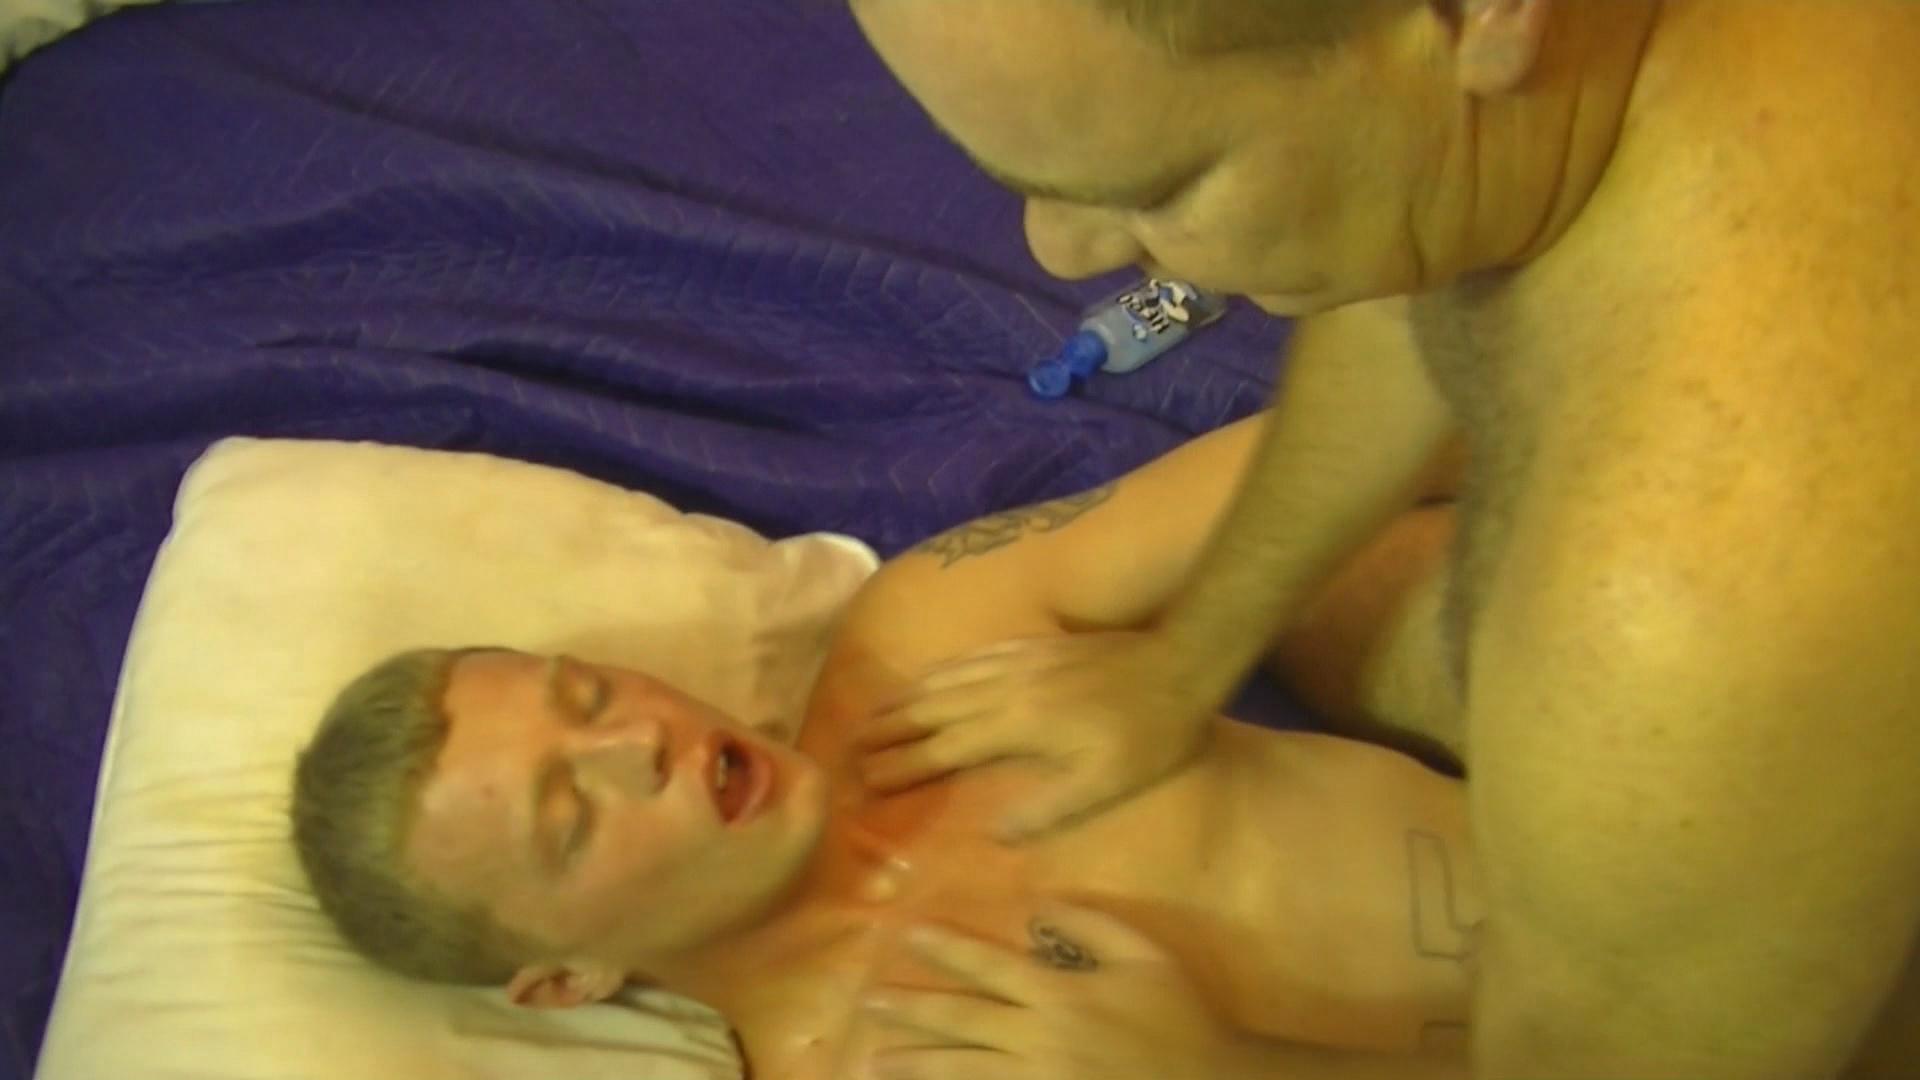 Whiteboy Worship 2 Xvideo gay